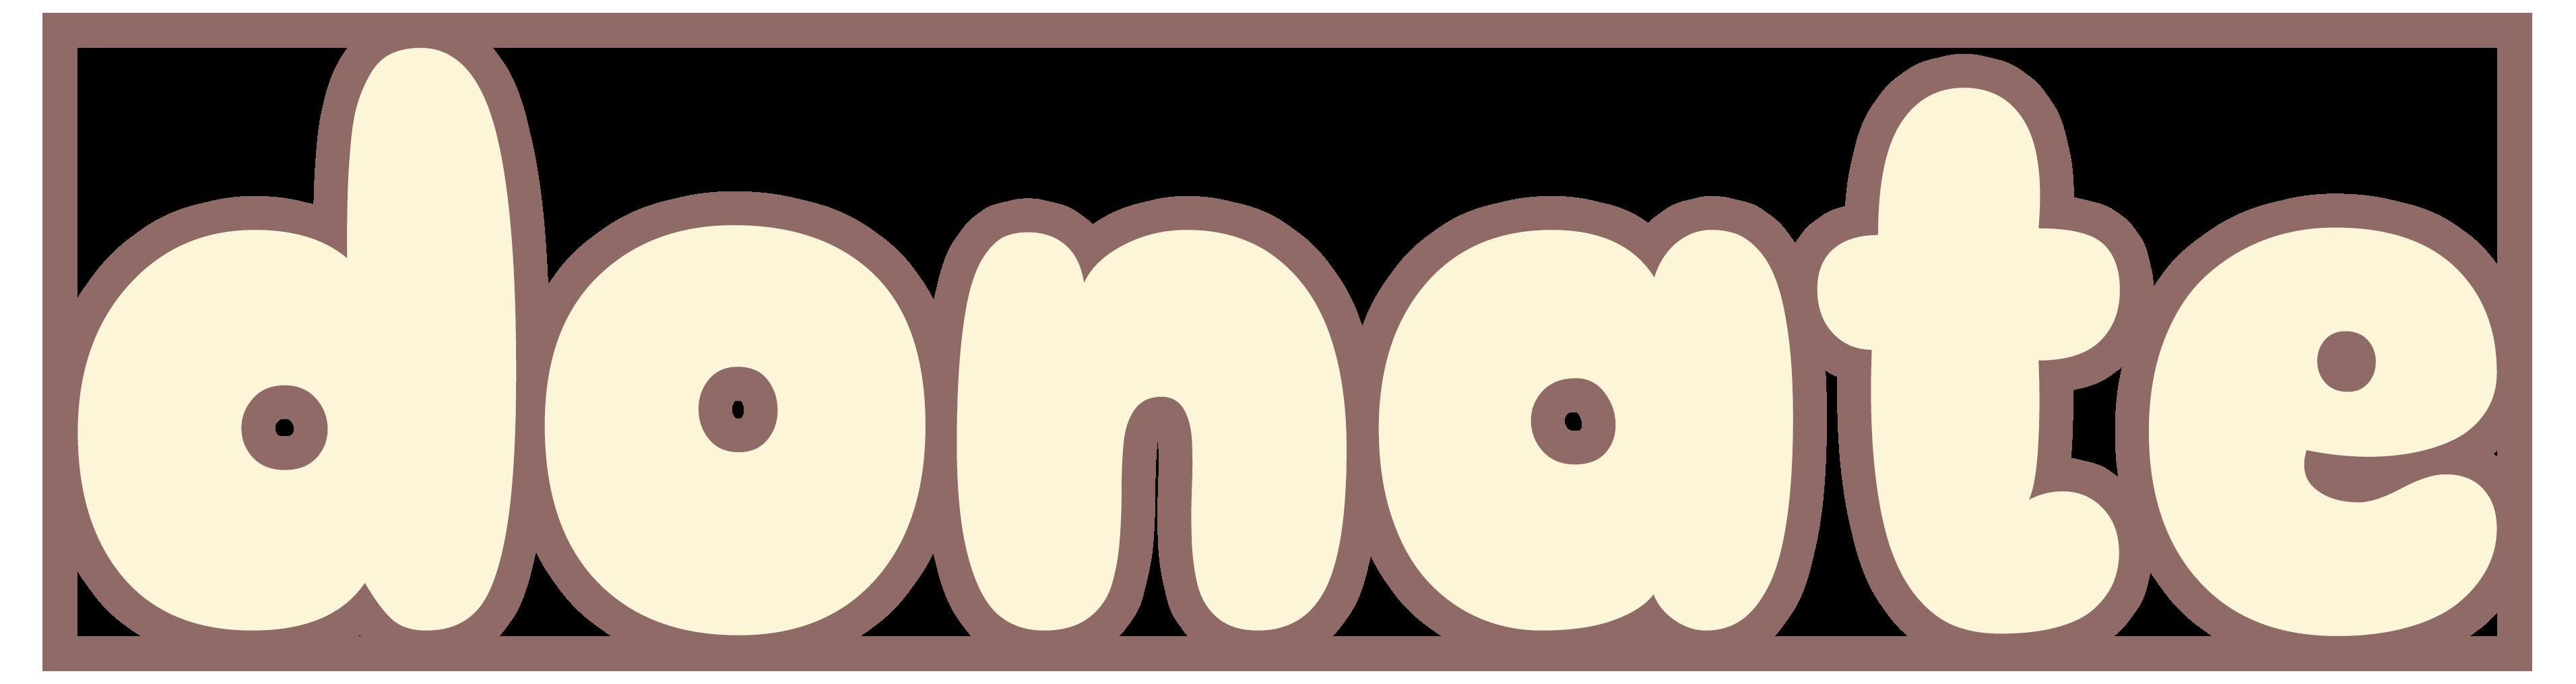 donate_banner